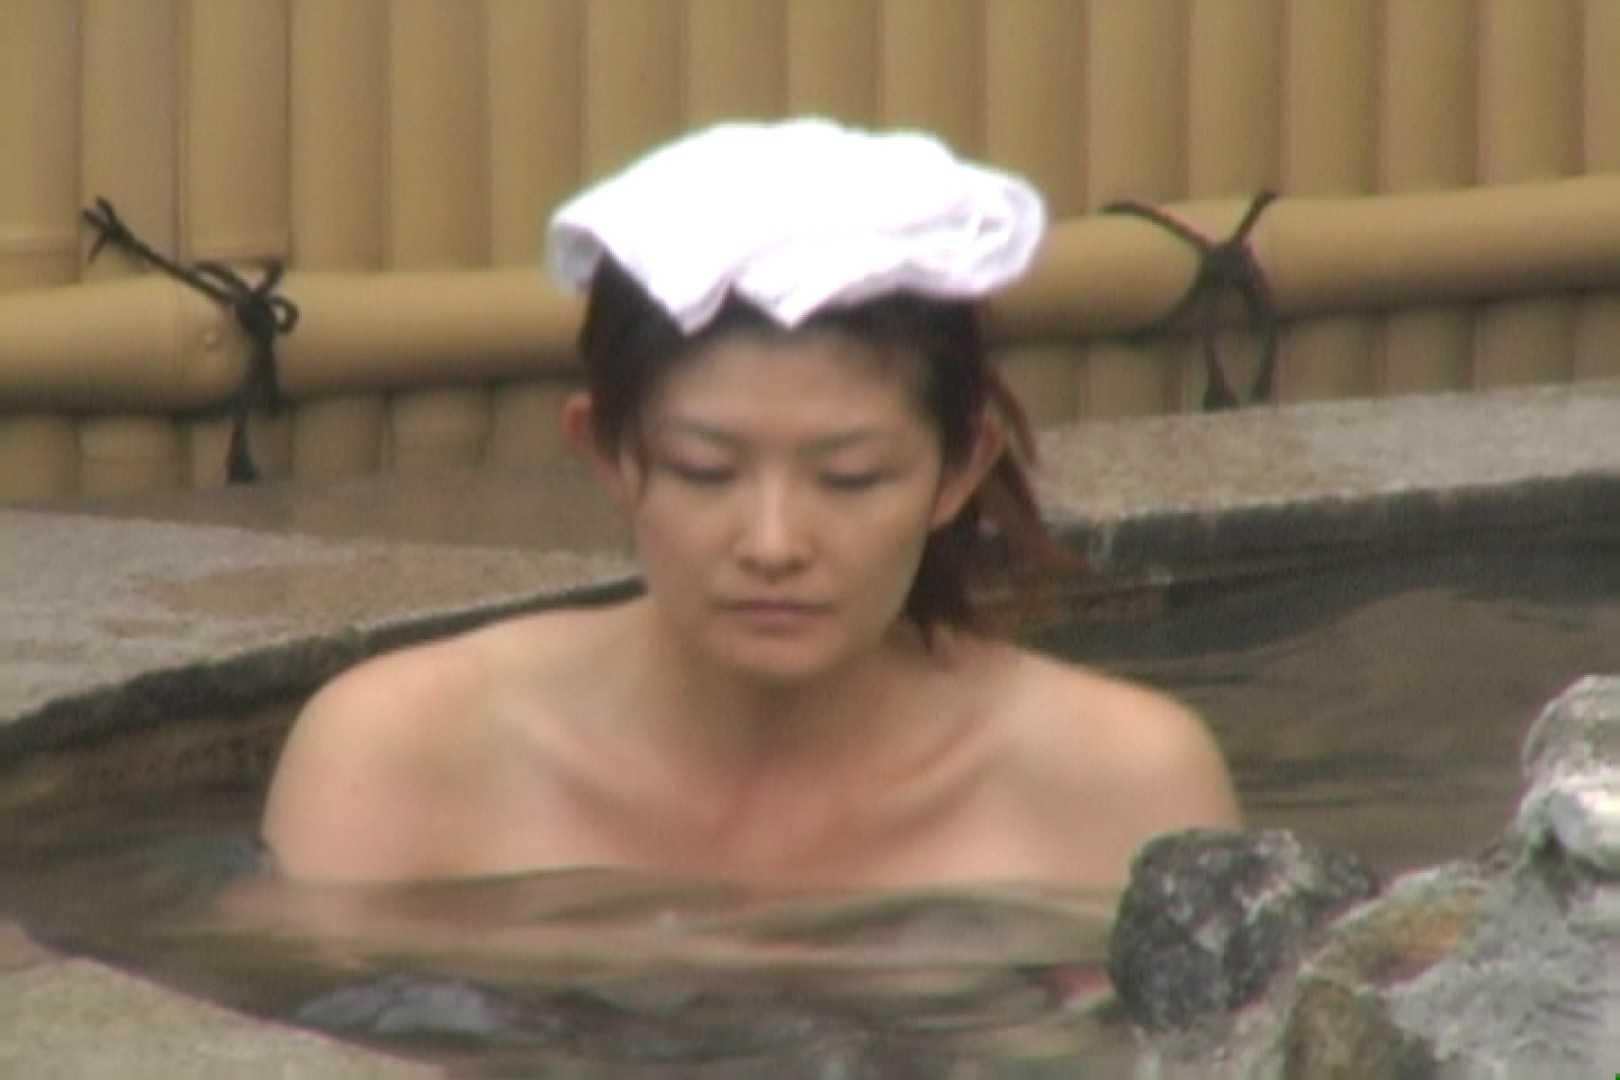 Aquaな露天風呂Vol.611 露天風呂編  97PIX 80